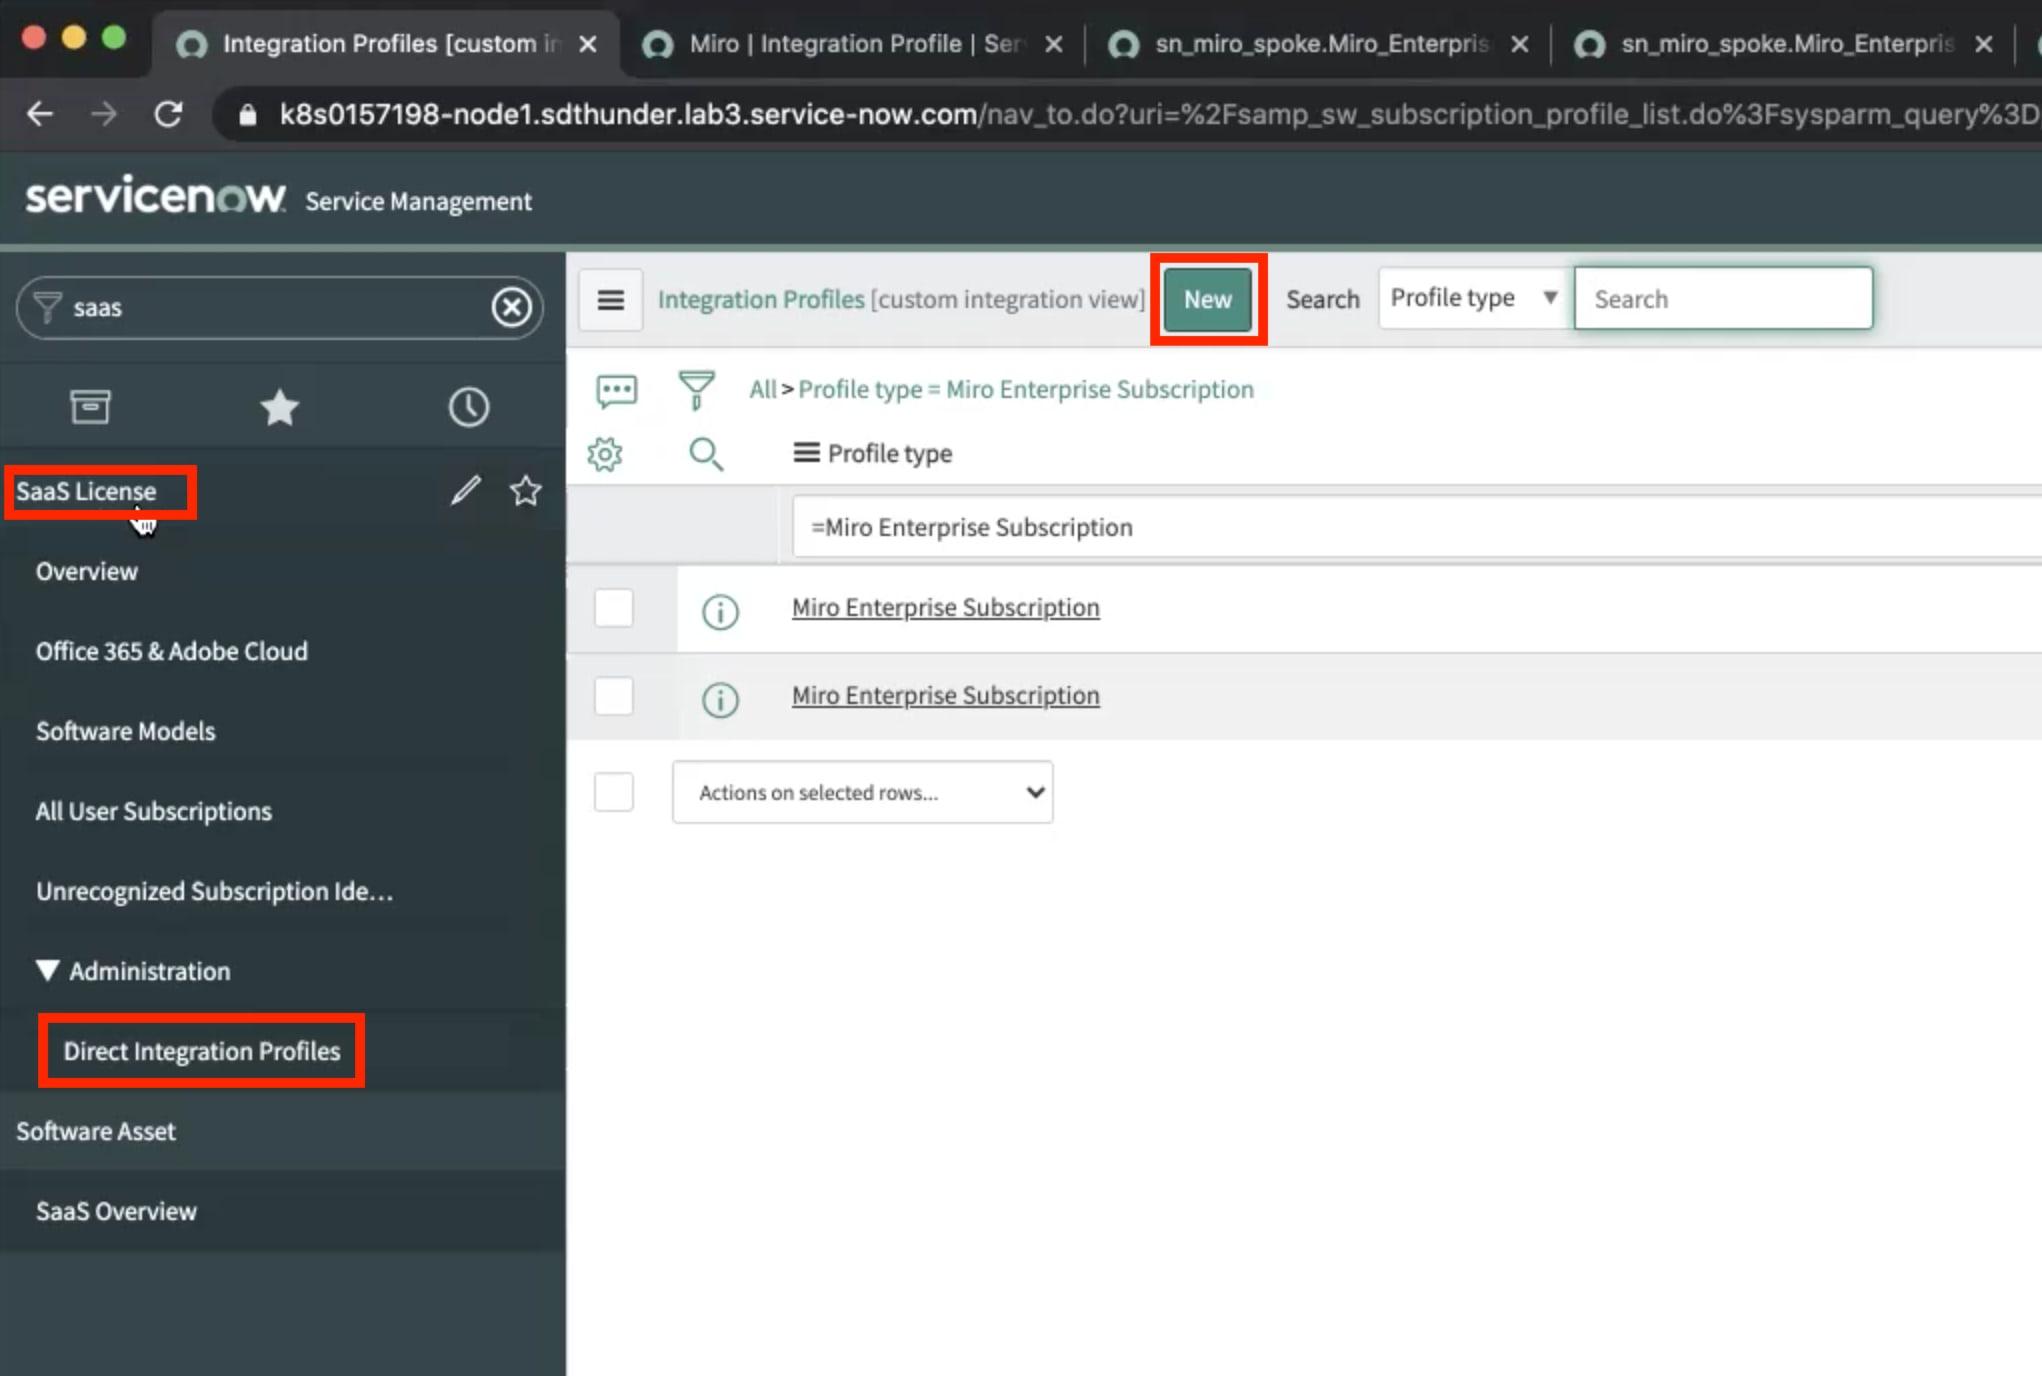 ServiceNow Salesforce - Direct Integration Profile